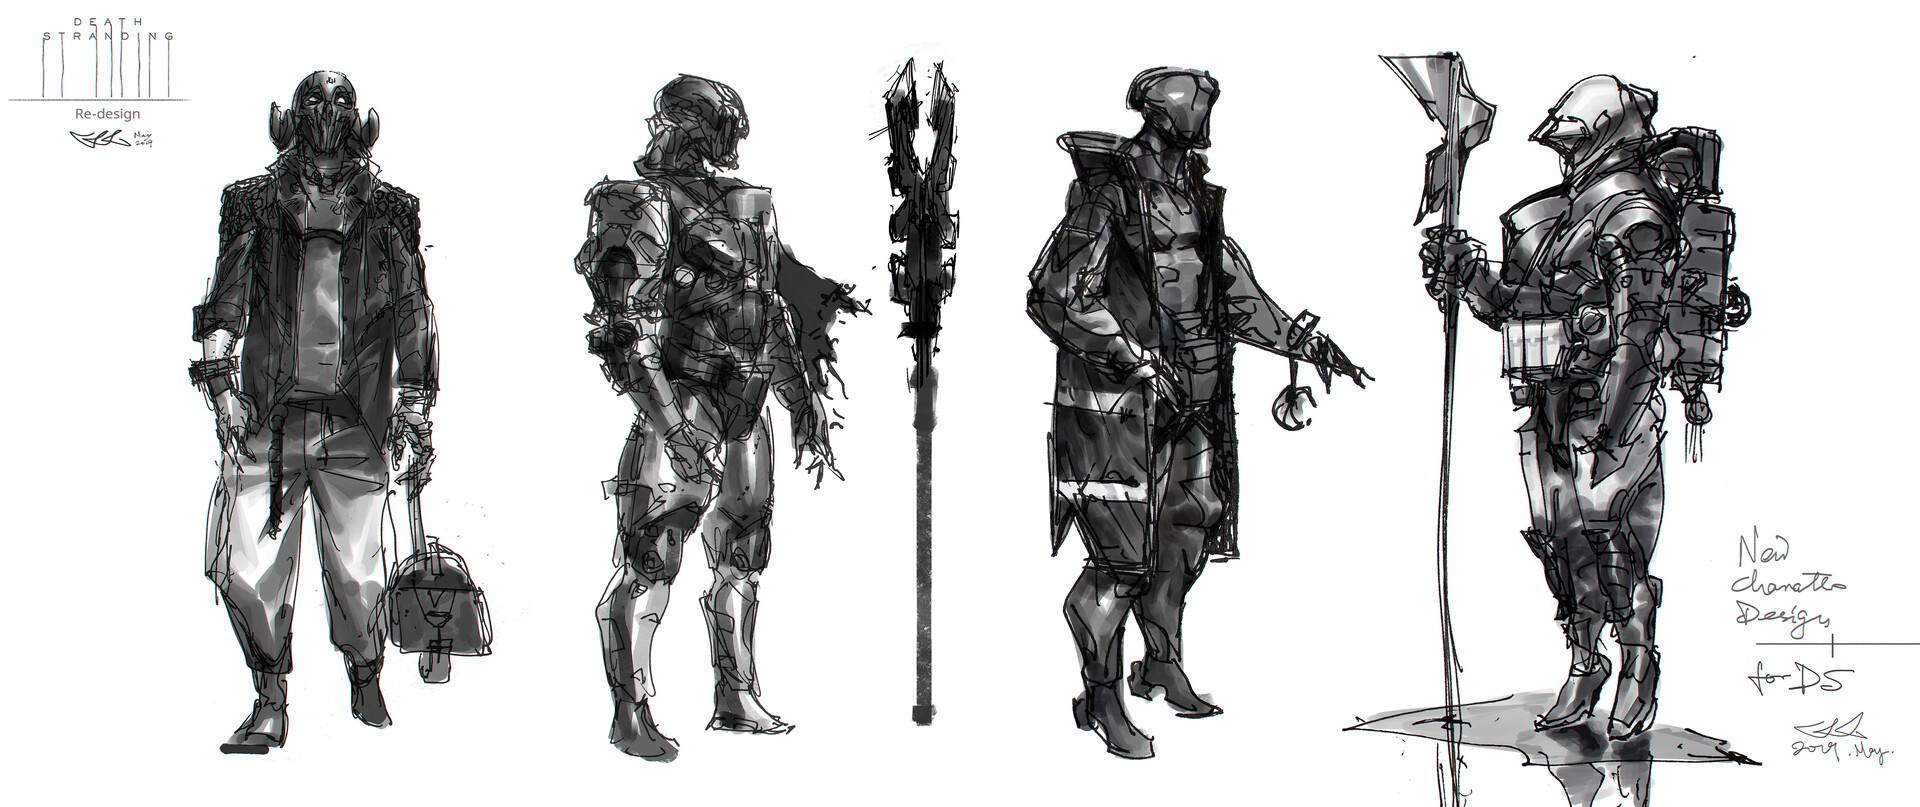 NPC character designs